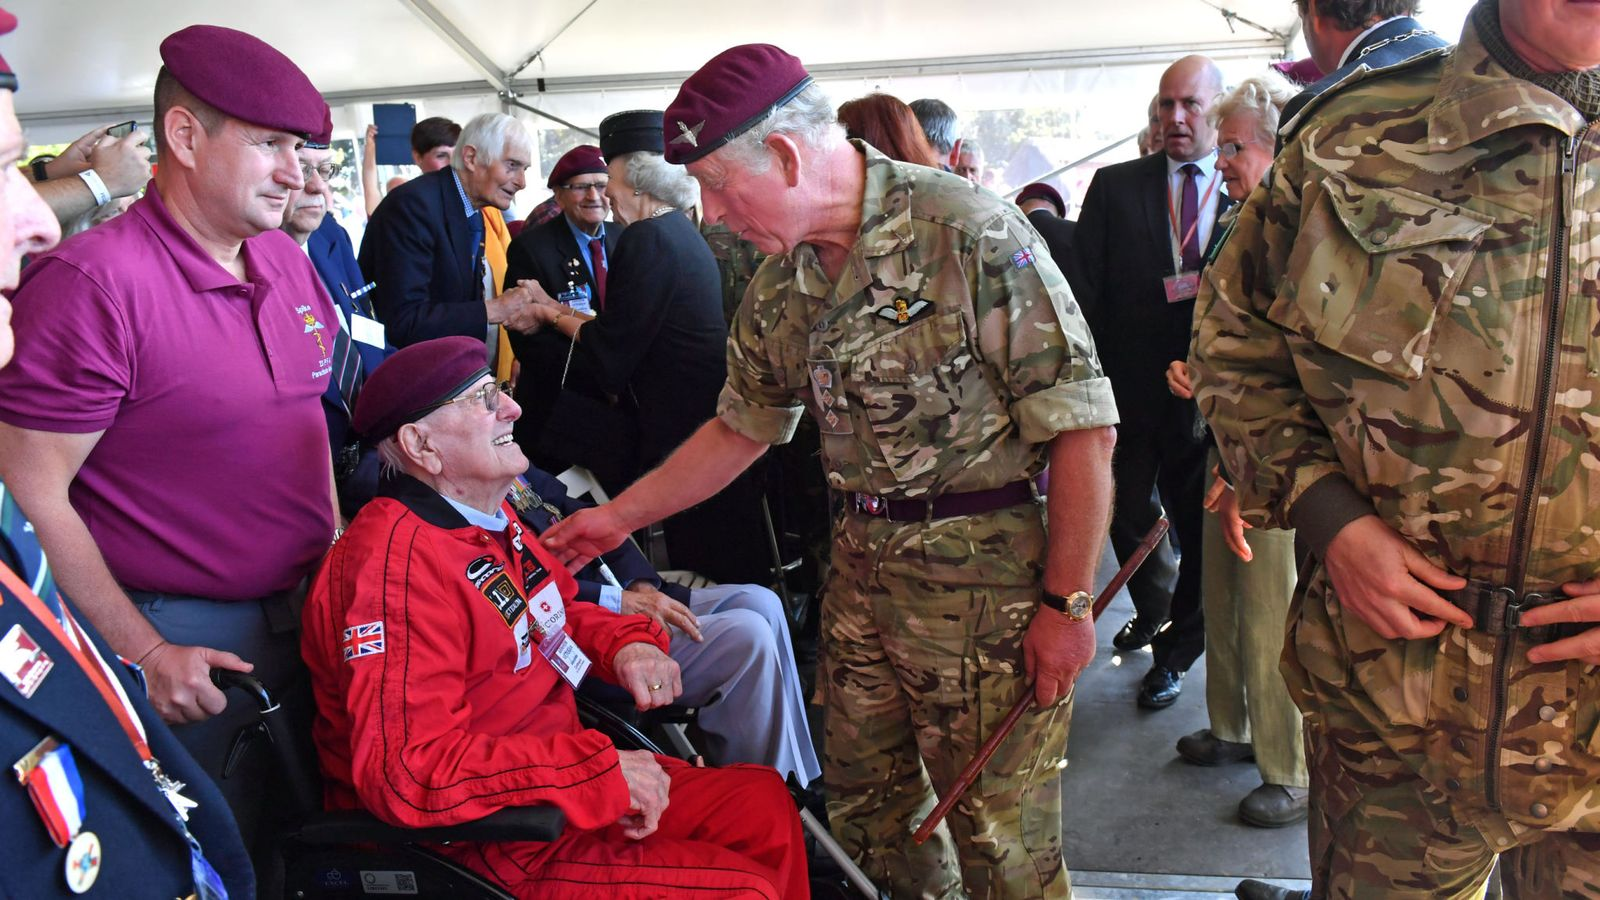 Arnhem: Veteran, 97, completes parachute jump to mark 75th anniversary memorial 1